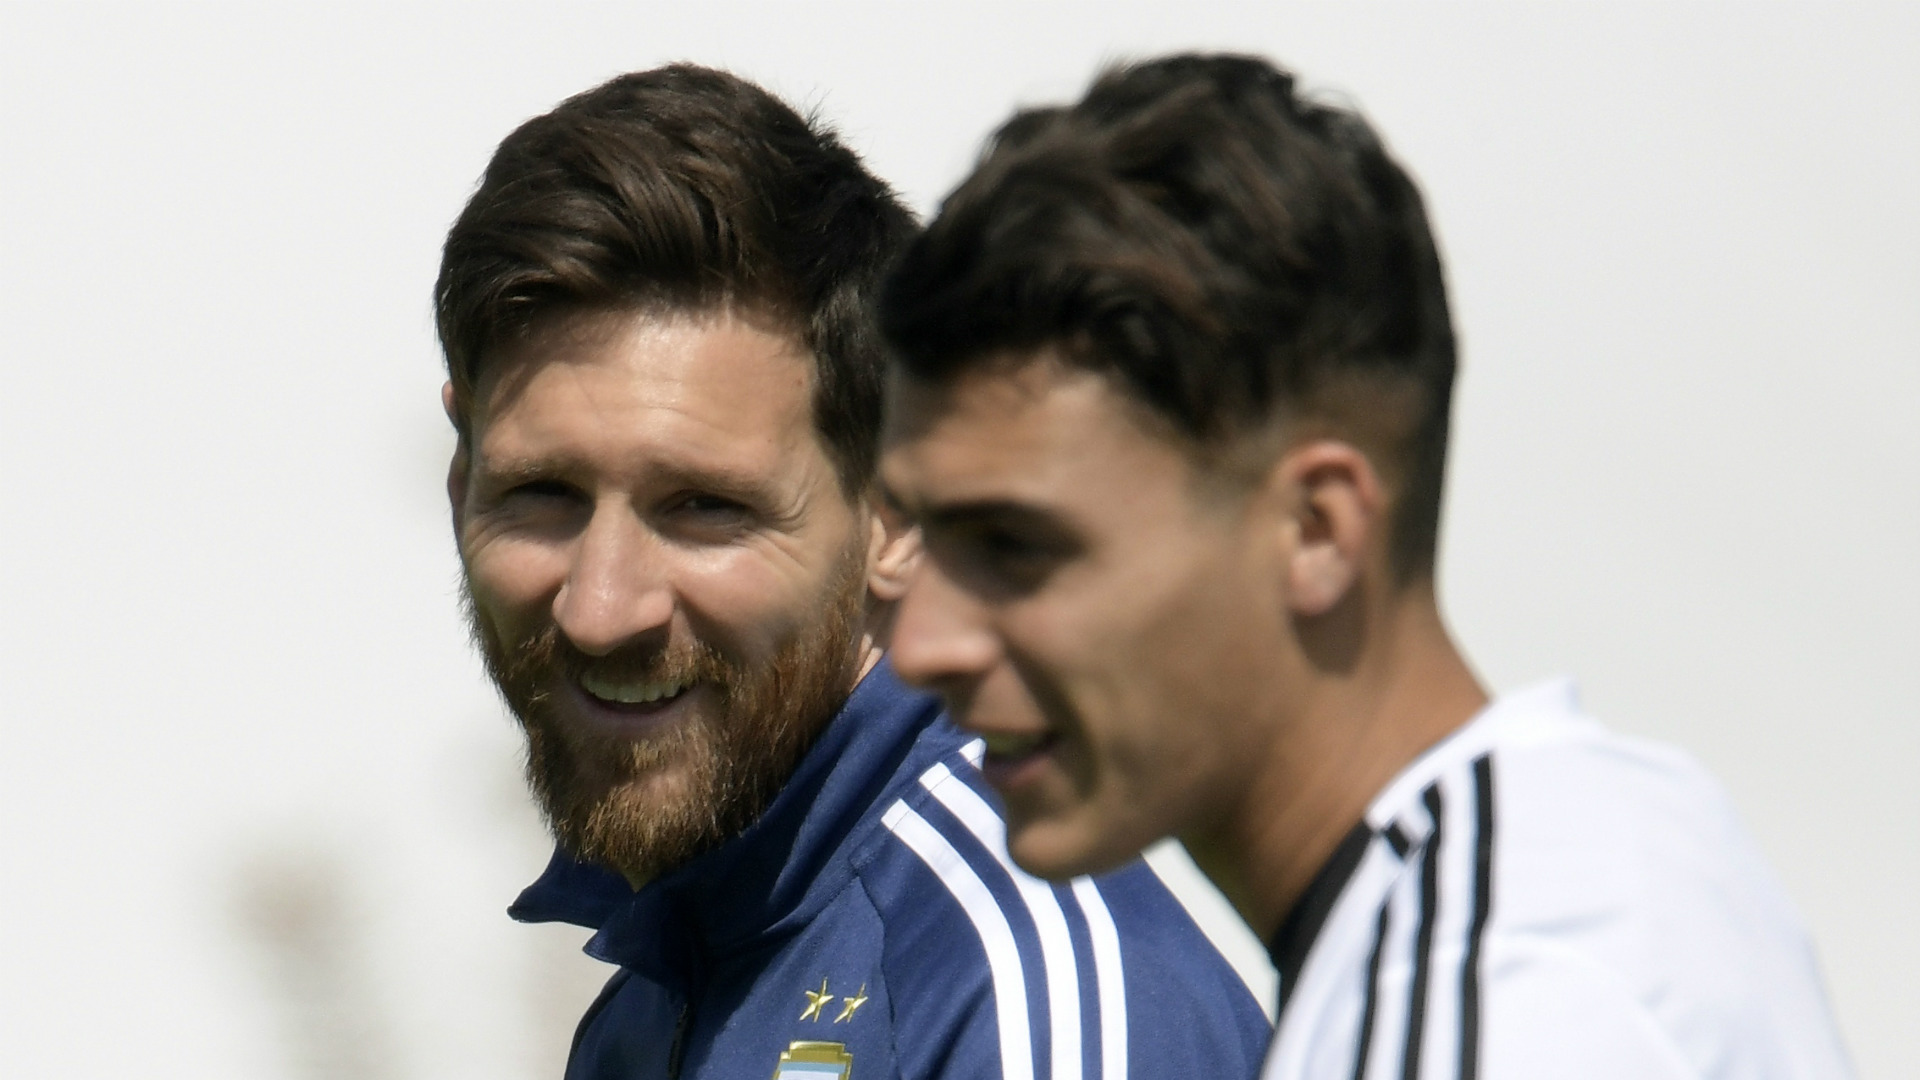 Argentina-Croazia 0-3: Modric illumina il Mondiale, Messi quasi a casa